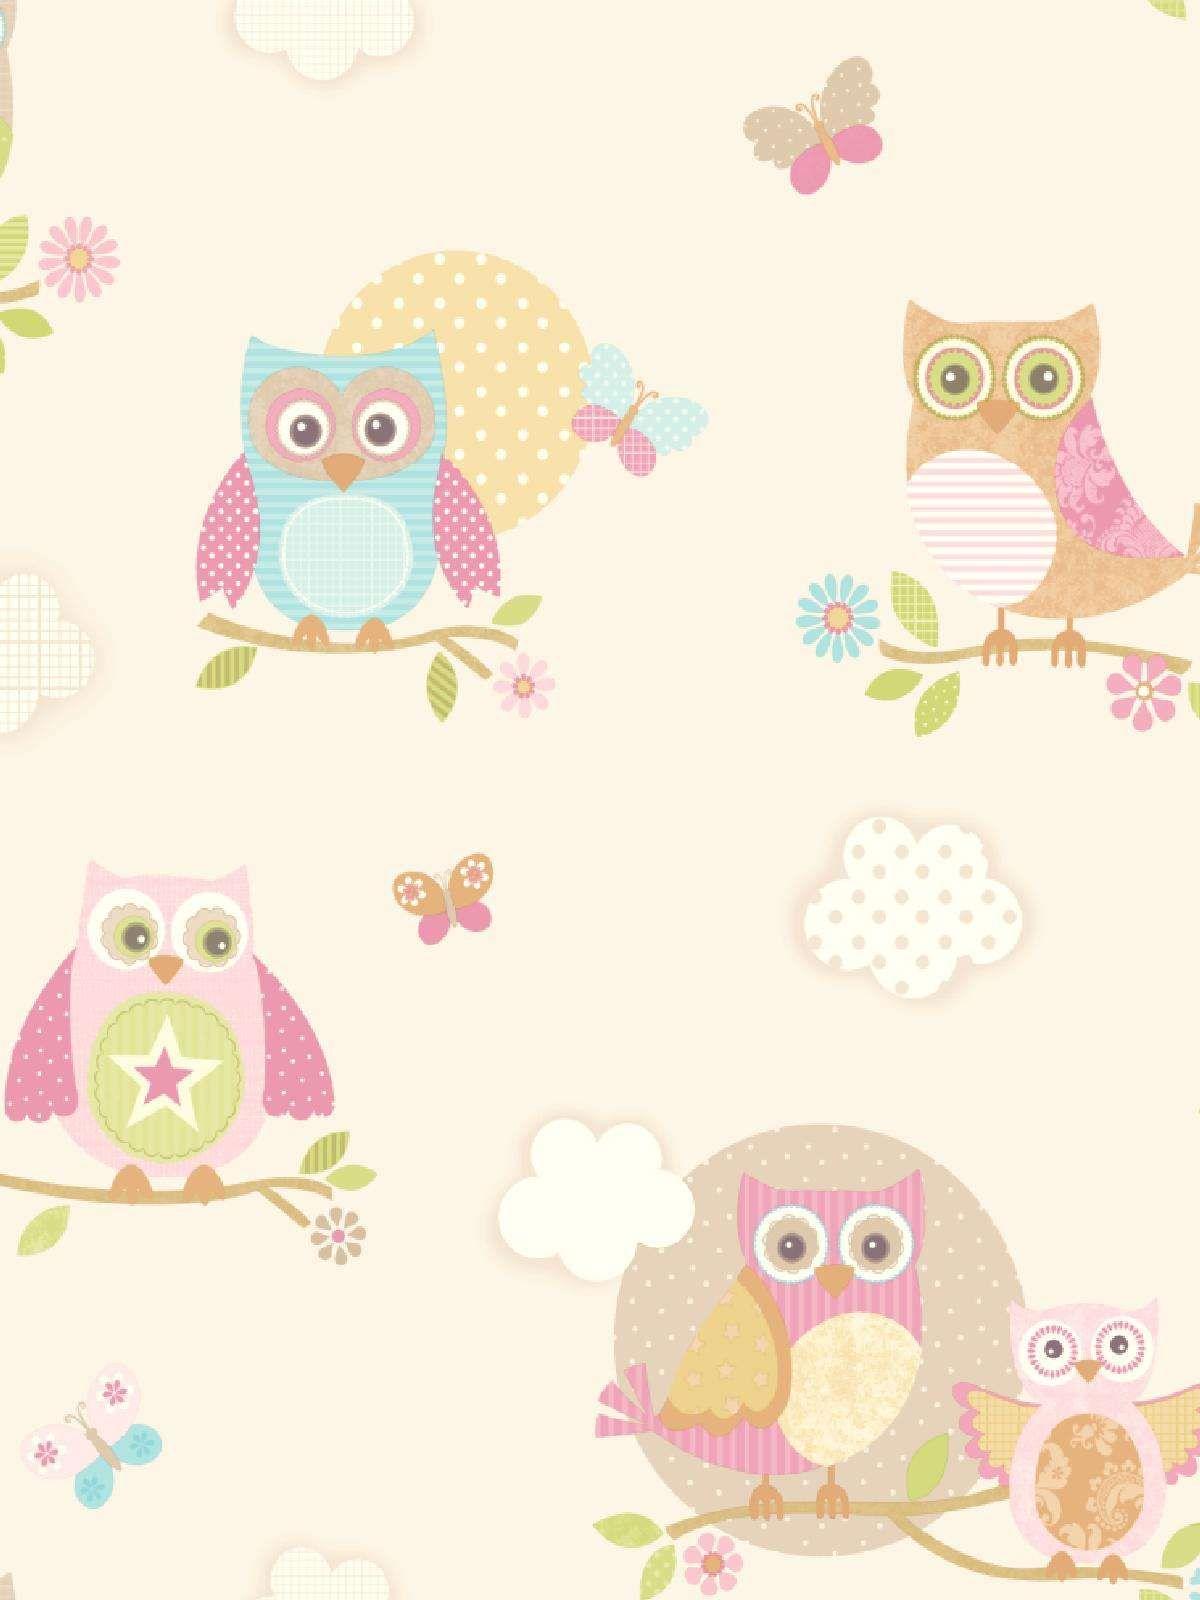 Simple Wallpaper High Quality Pastel - 73c9a675ab9e0052ea2b98212b84cc1c  Trends_803667.jpg